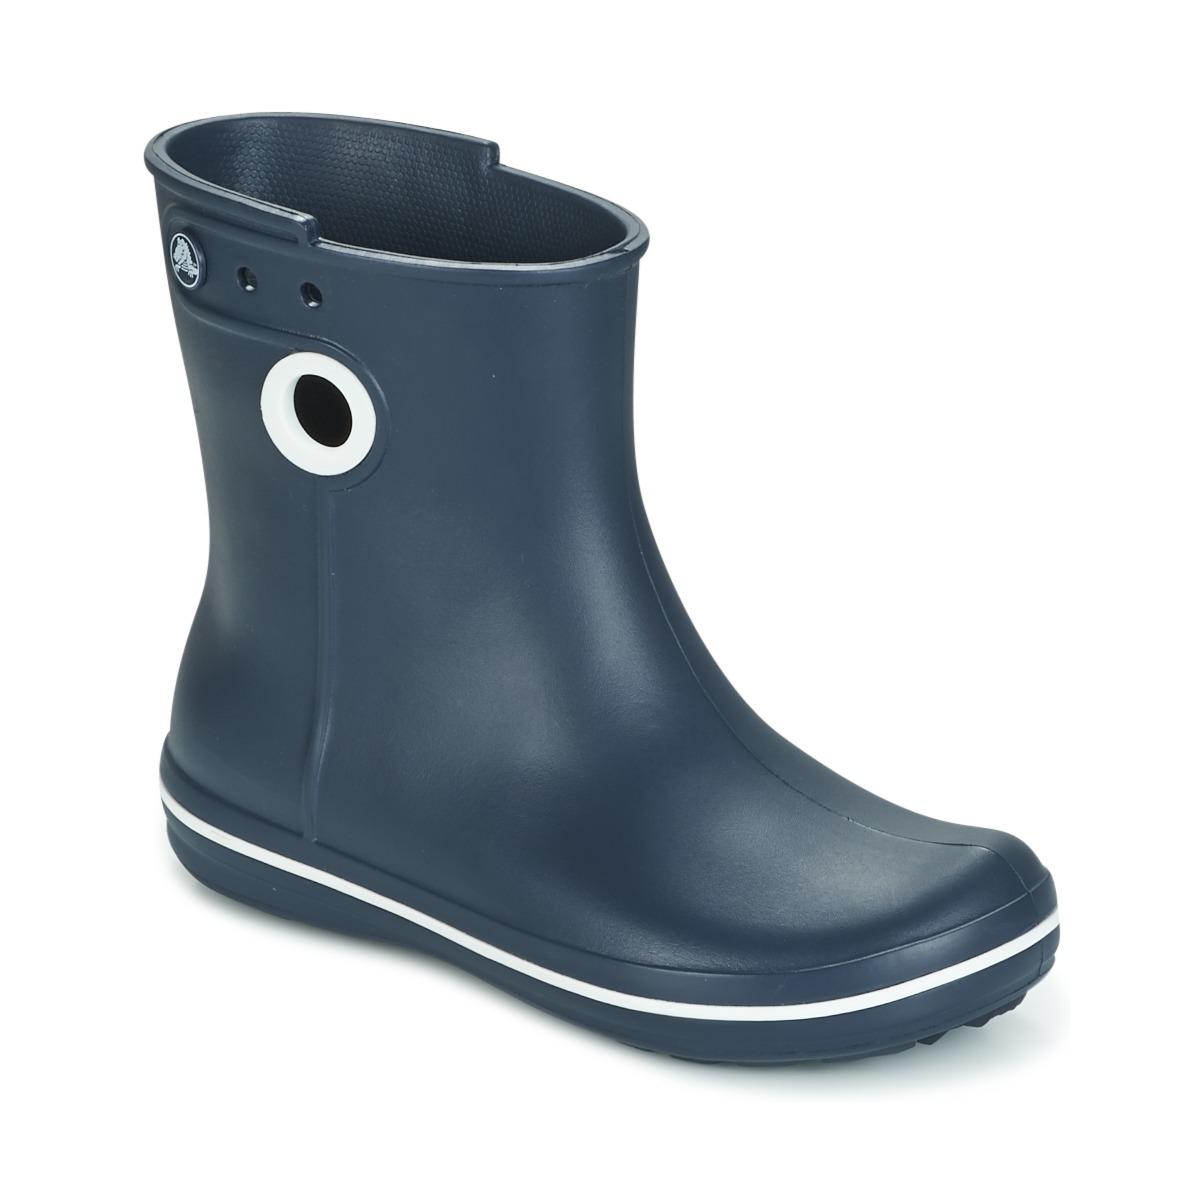 082f4ebc19ee0 Crocs Gumene čizme JAUNT SHORTY BOOTS Blue - Jeftinije.hr